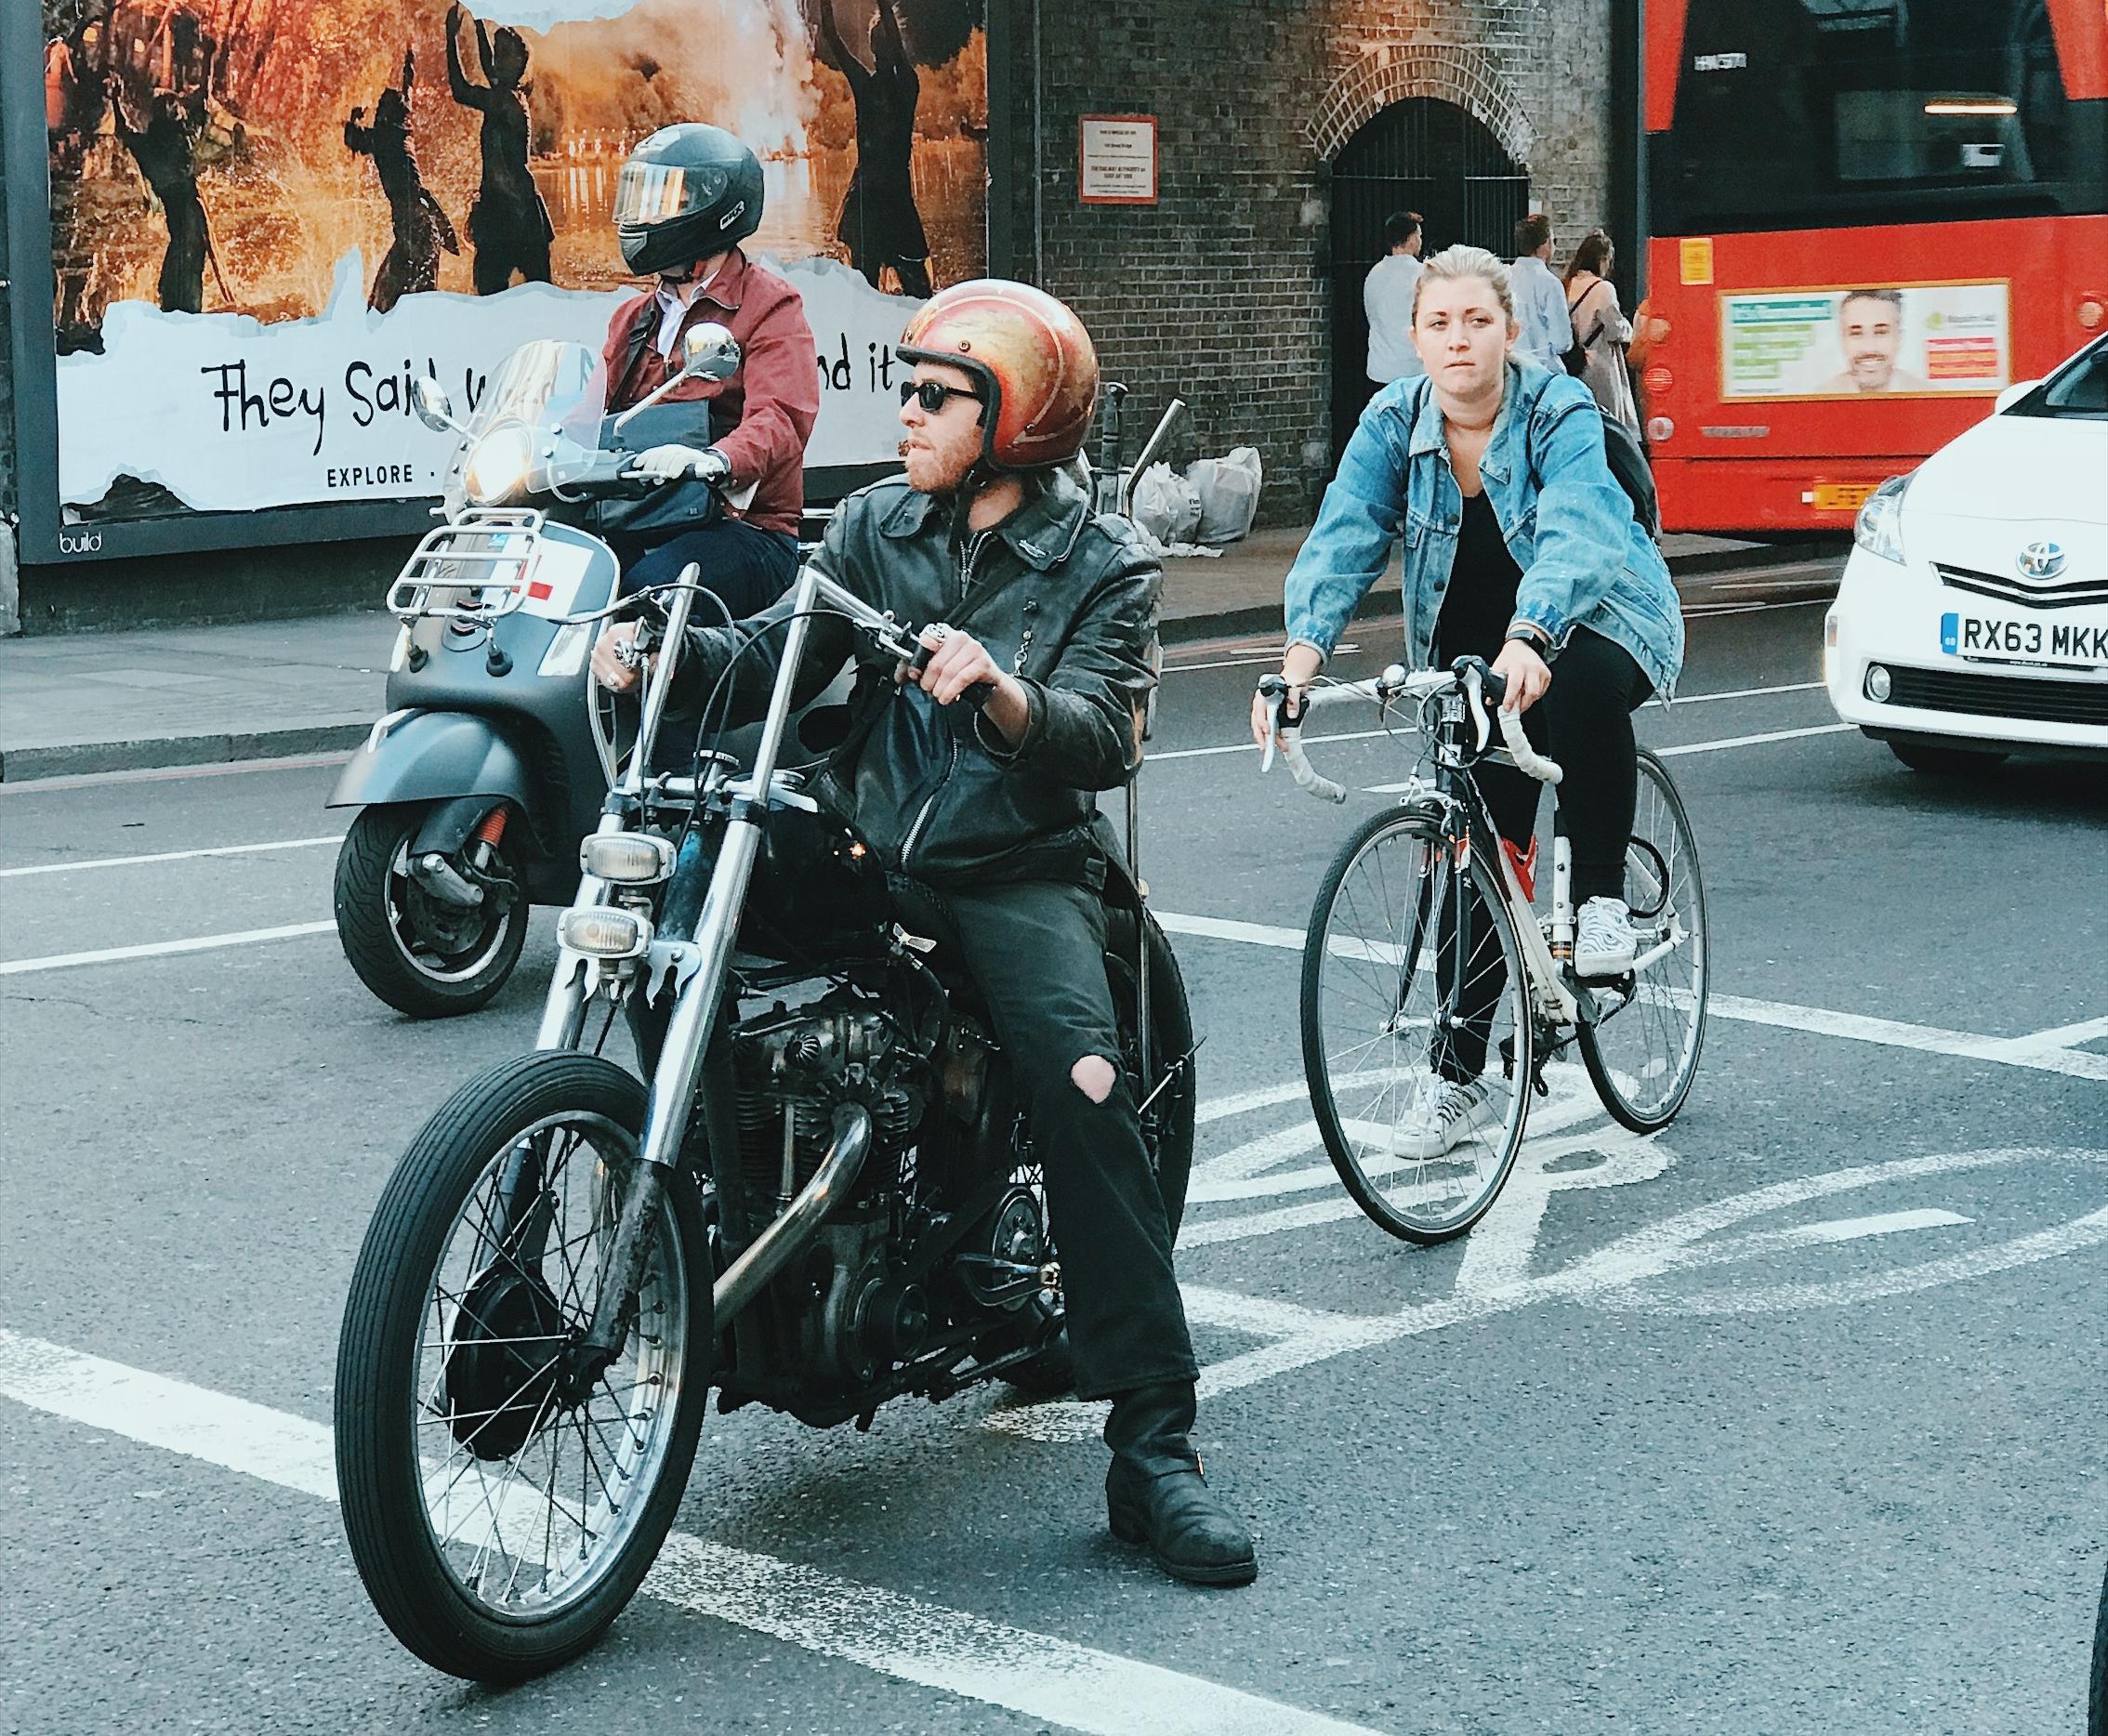 The Bike Shed East London